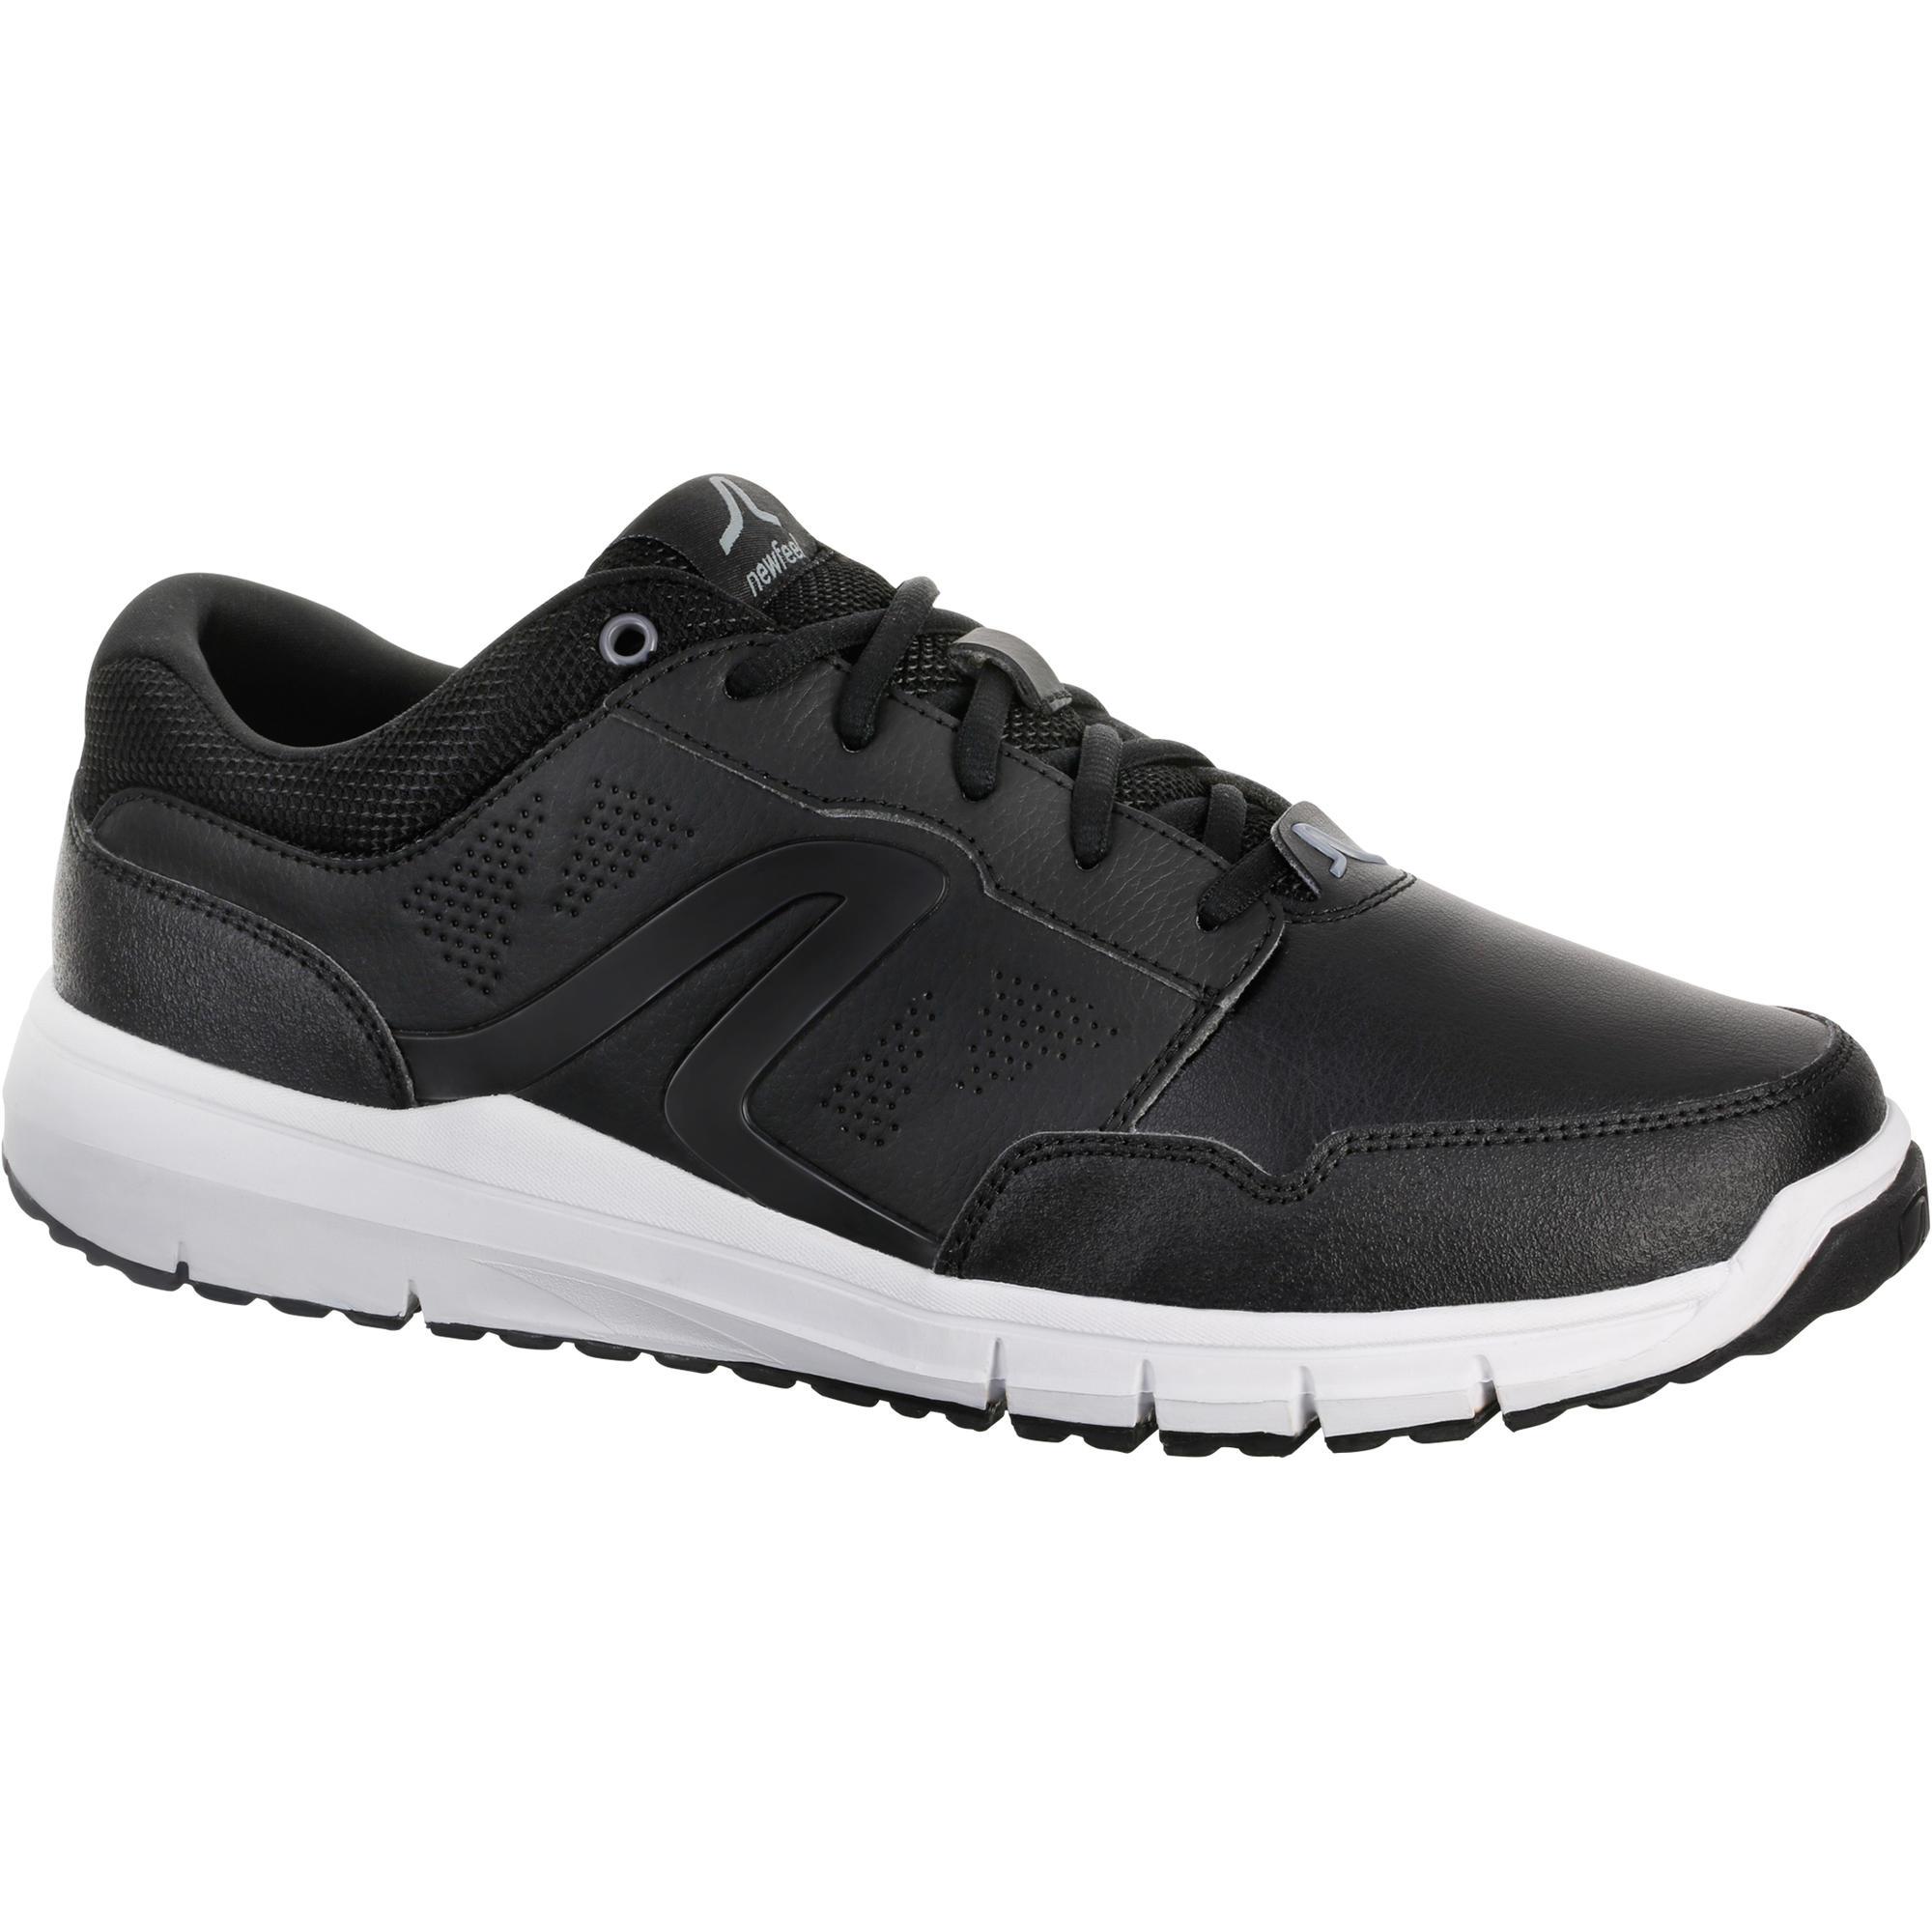 8a8307d528f33d chaussure newfeel essensole